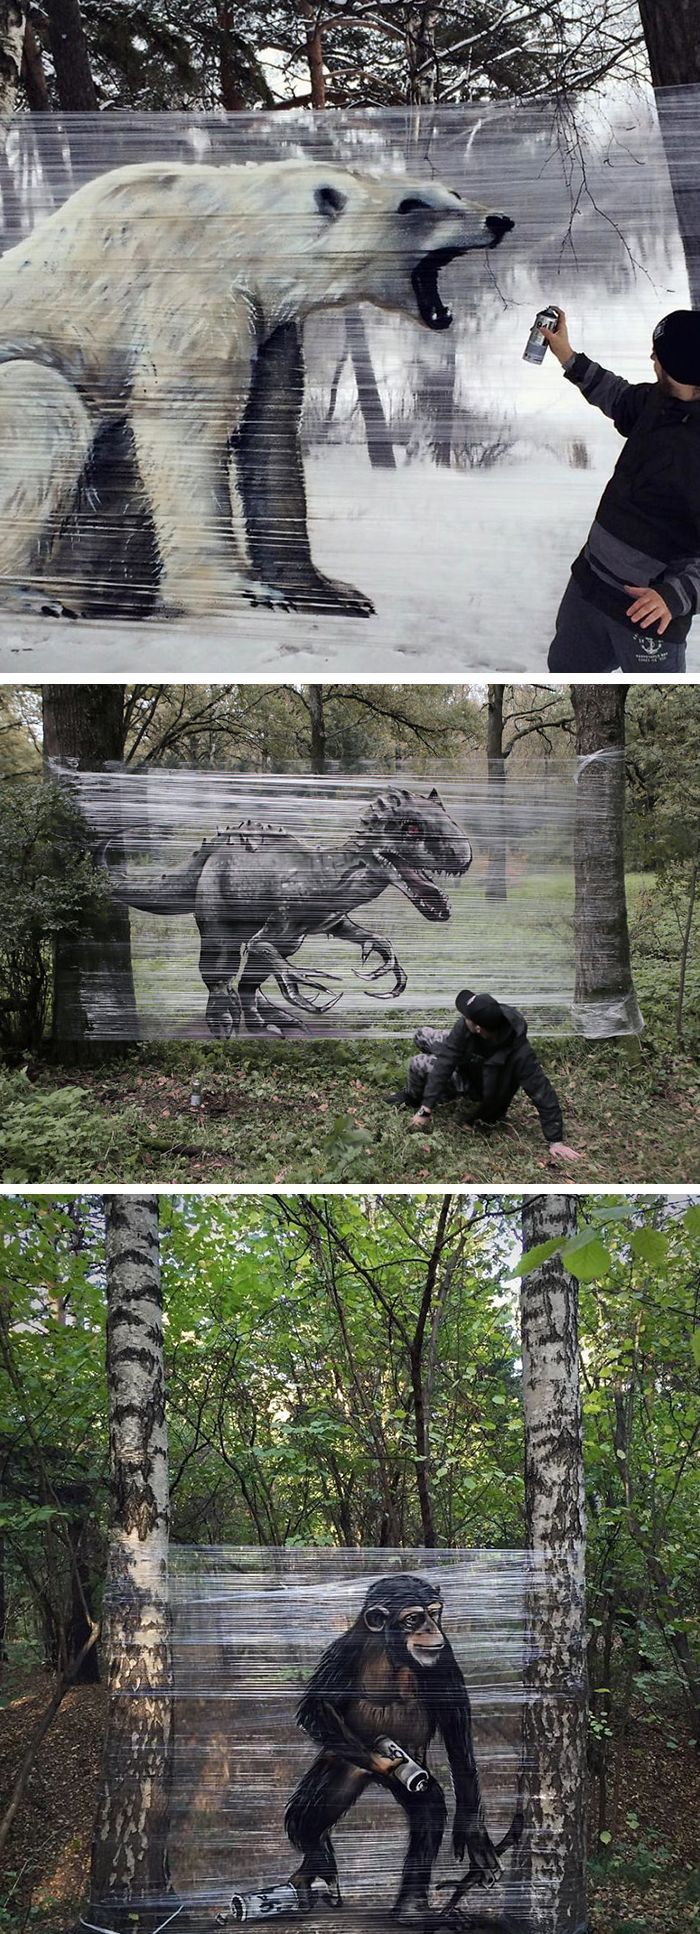 Graffiti Artist Spray-Paints Giant Animals onto Pl…